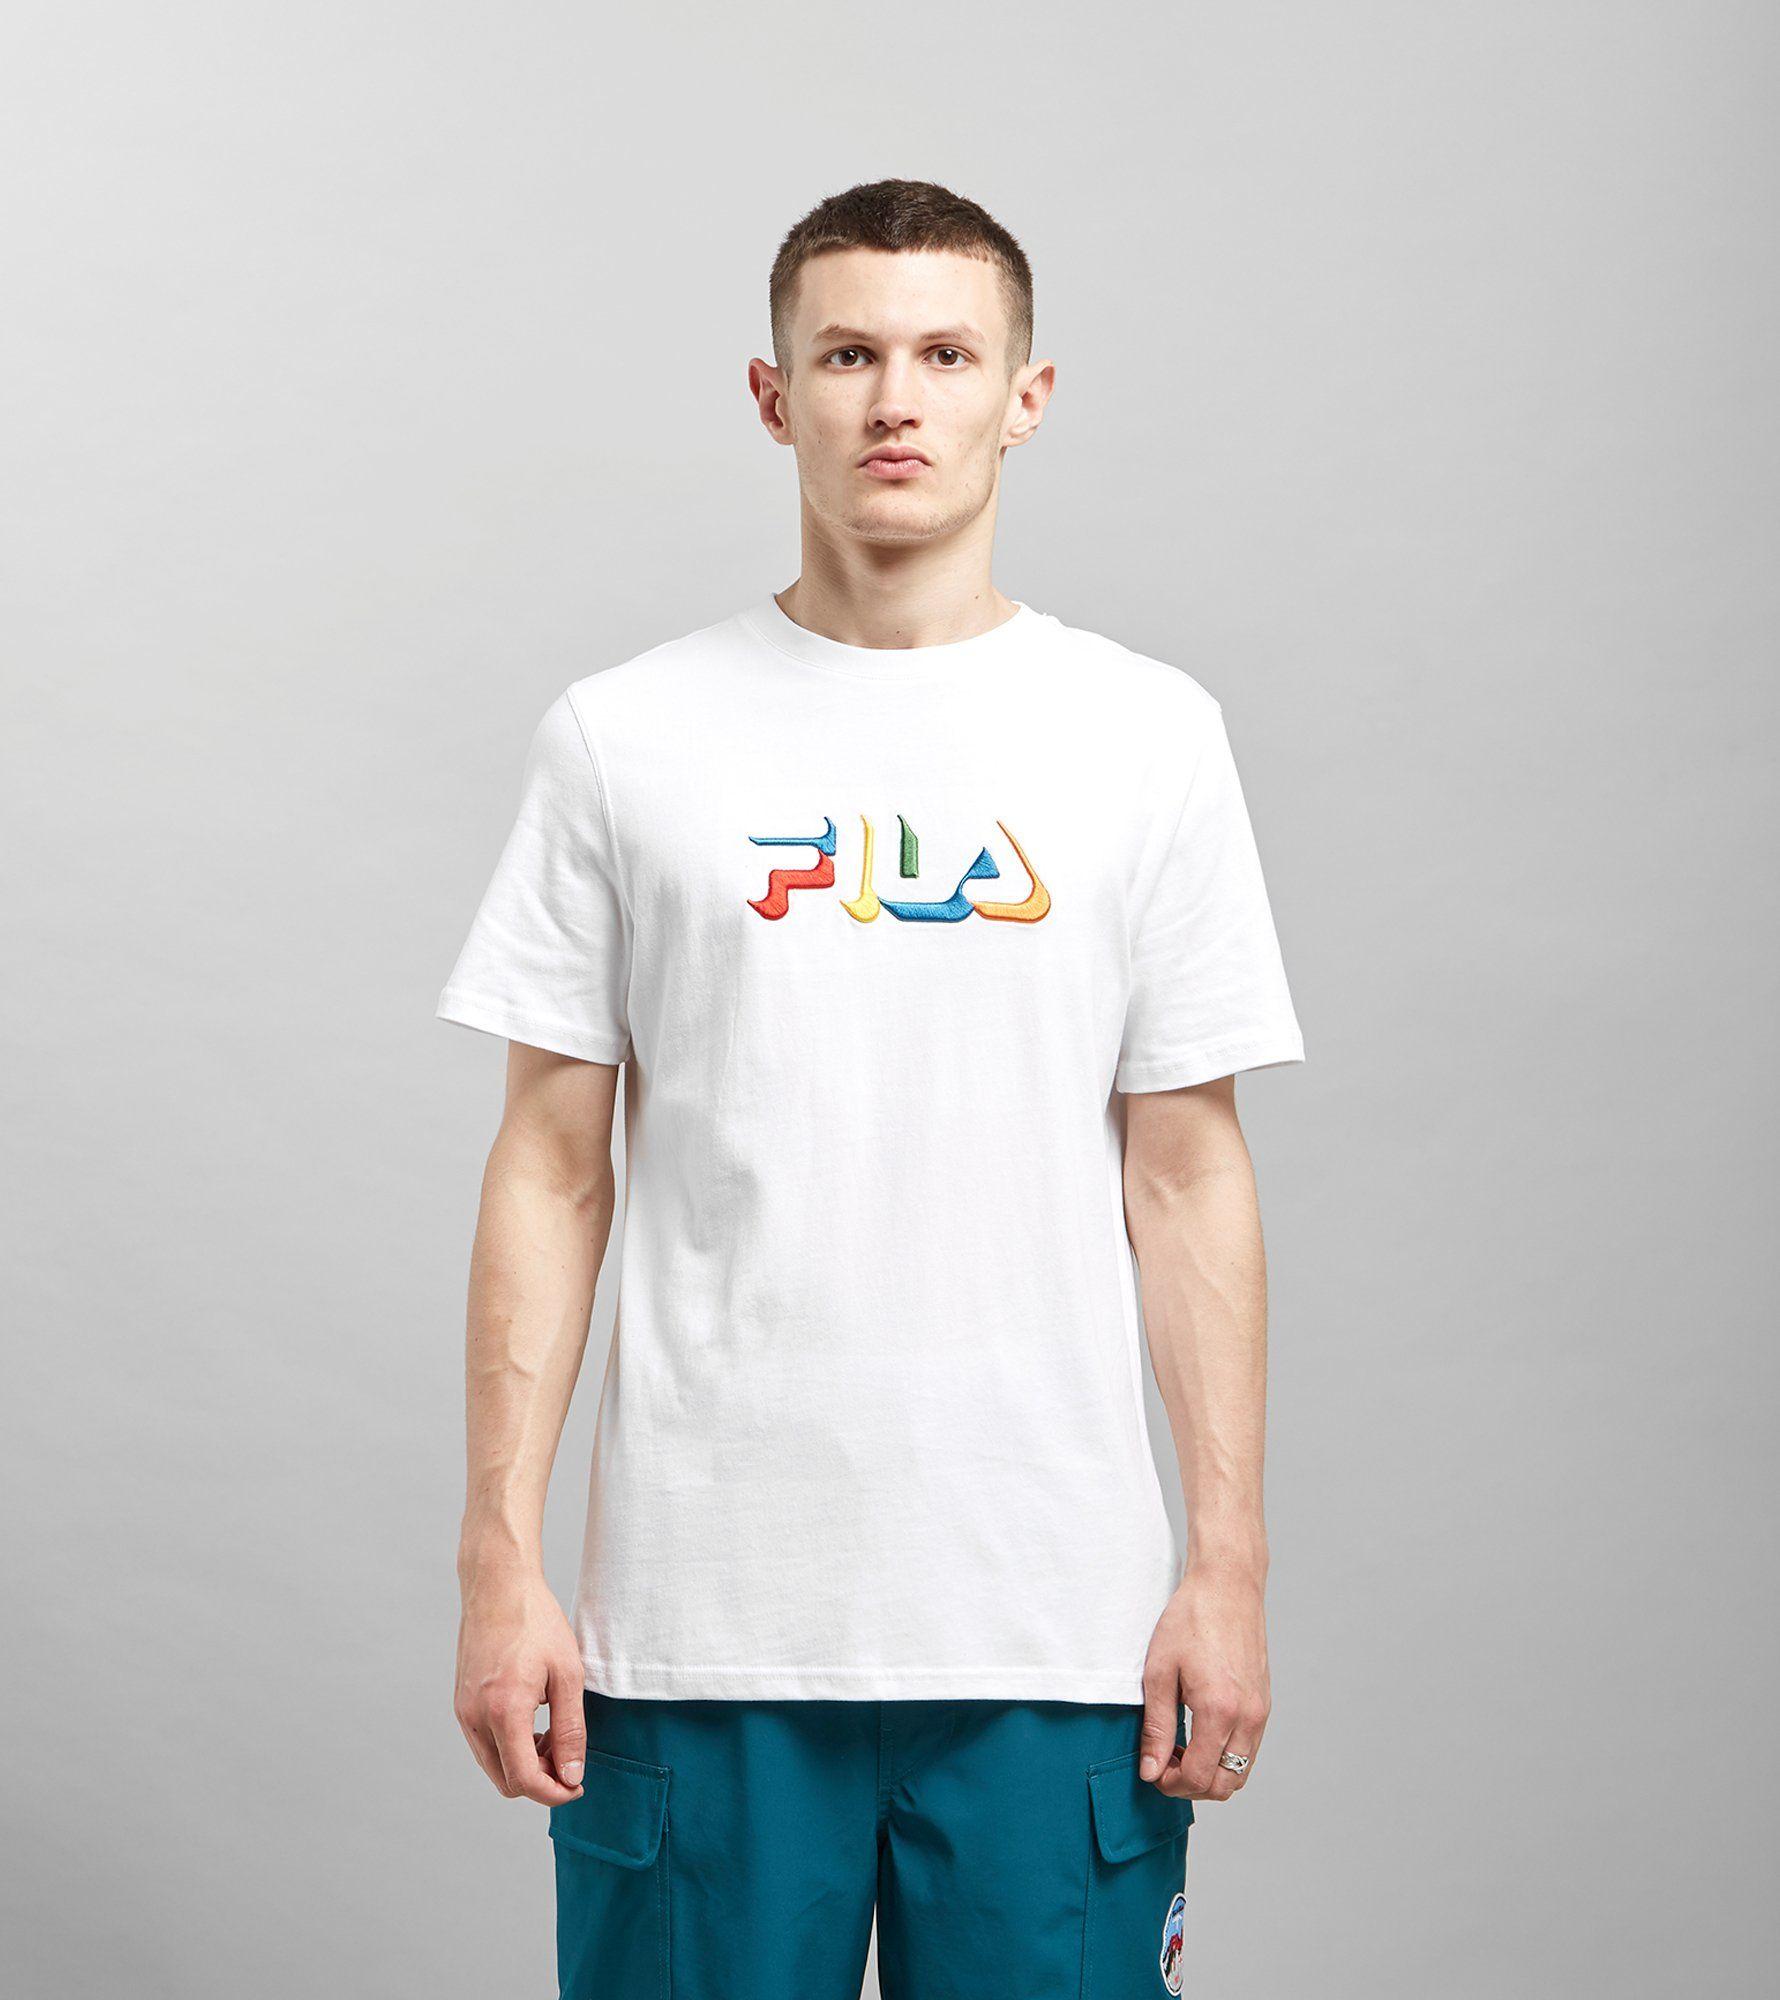 Fila Etna Short Sleeve T-Shirt